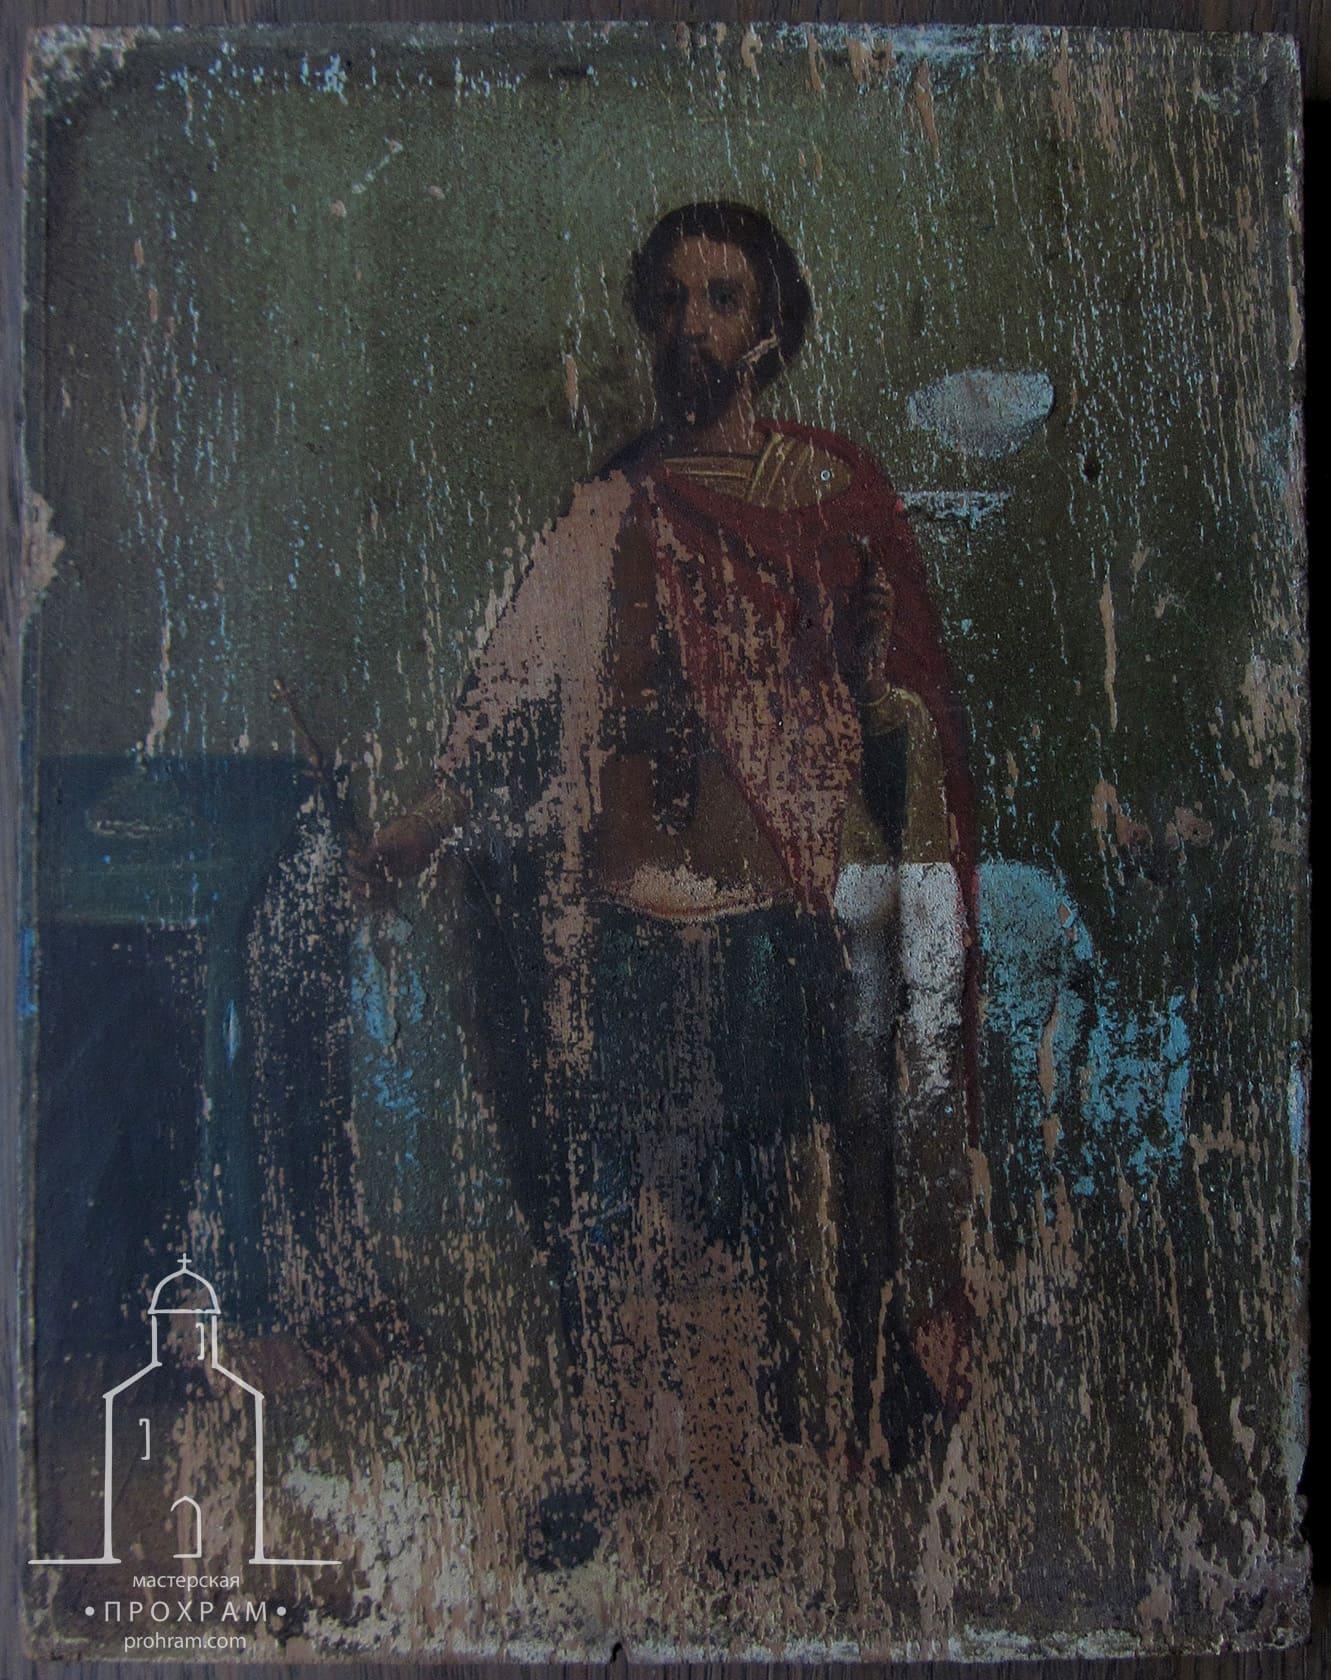 Реставрация, Св. Александр Невский, реставрация икон, реставрация икон этапы, реставрация иконы фото до и после